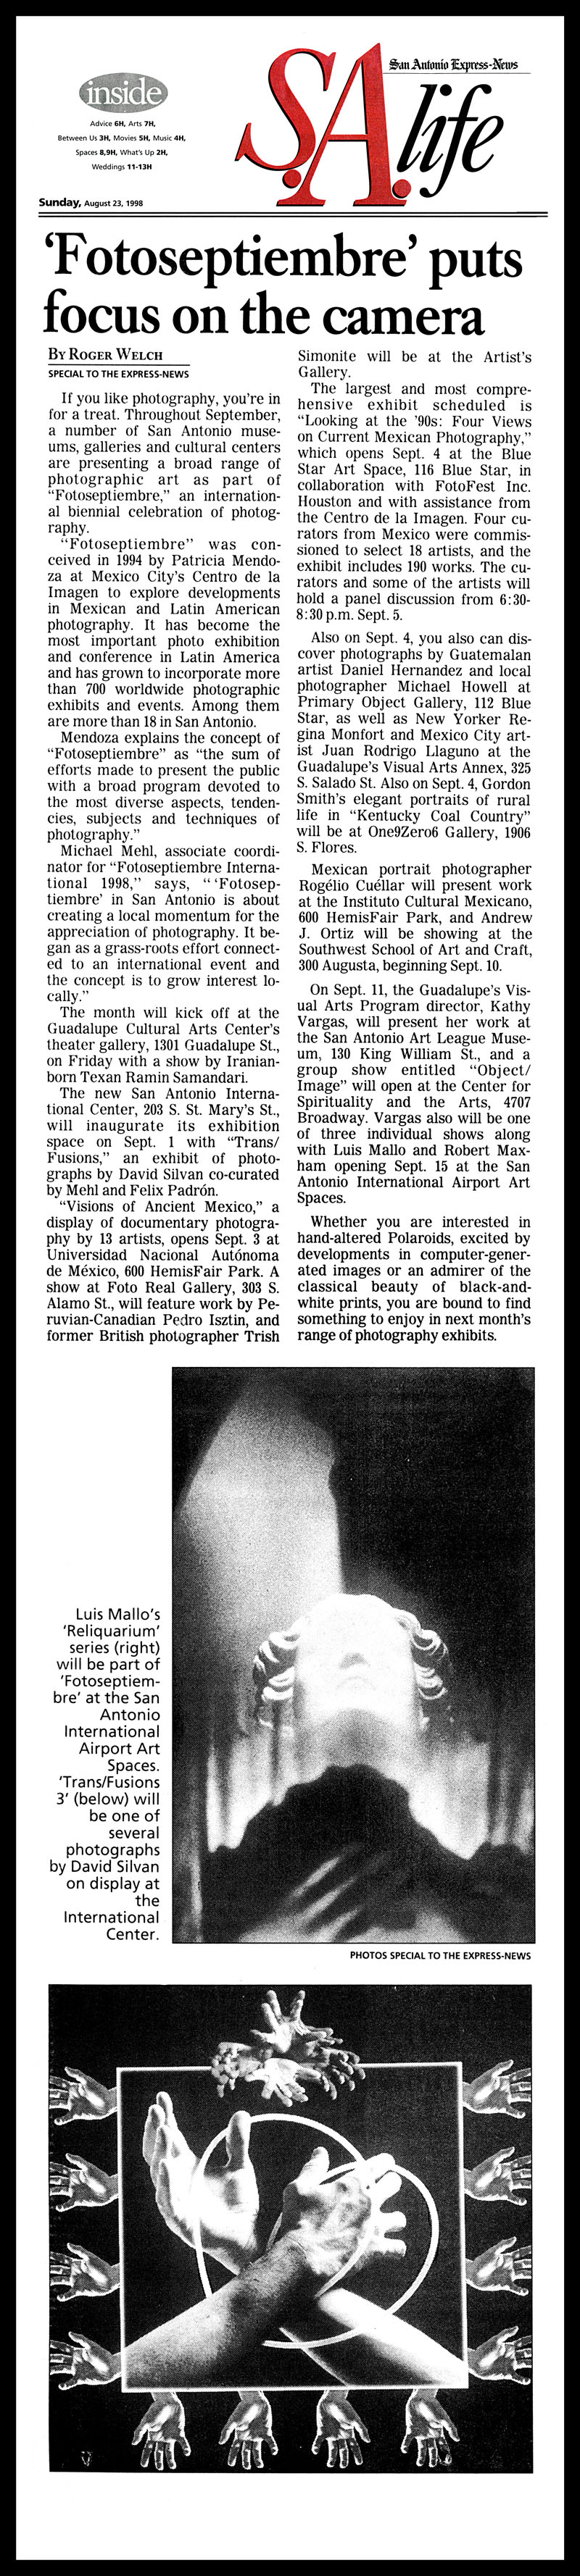 1998_Michael-Mehl-Fotoseptiembre-Focus-On-Camera_San-Antonio-Express-News